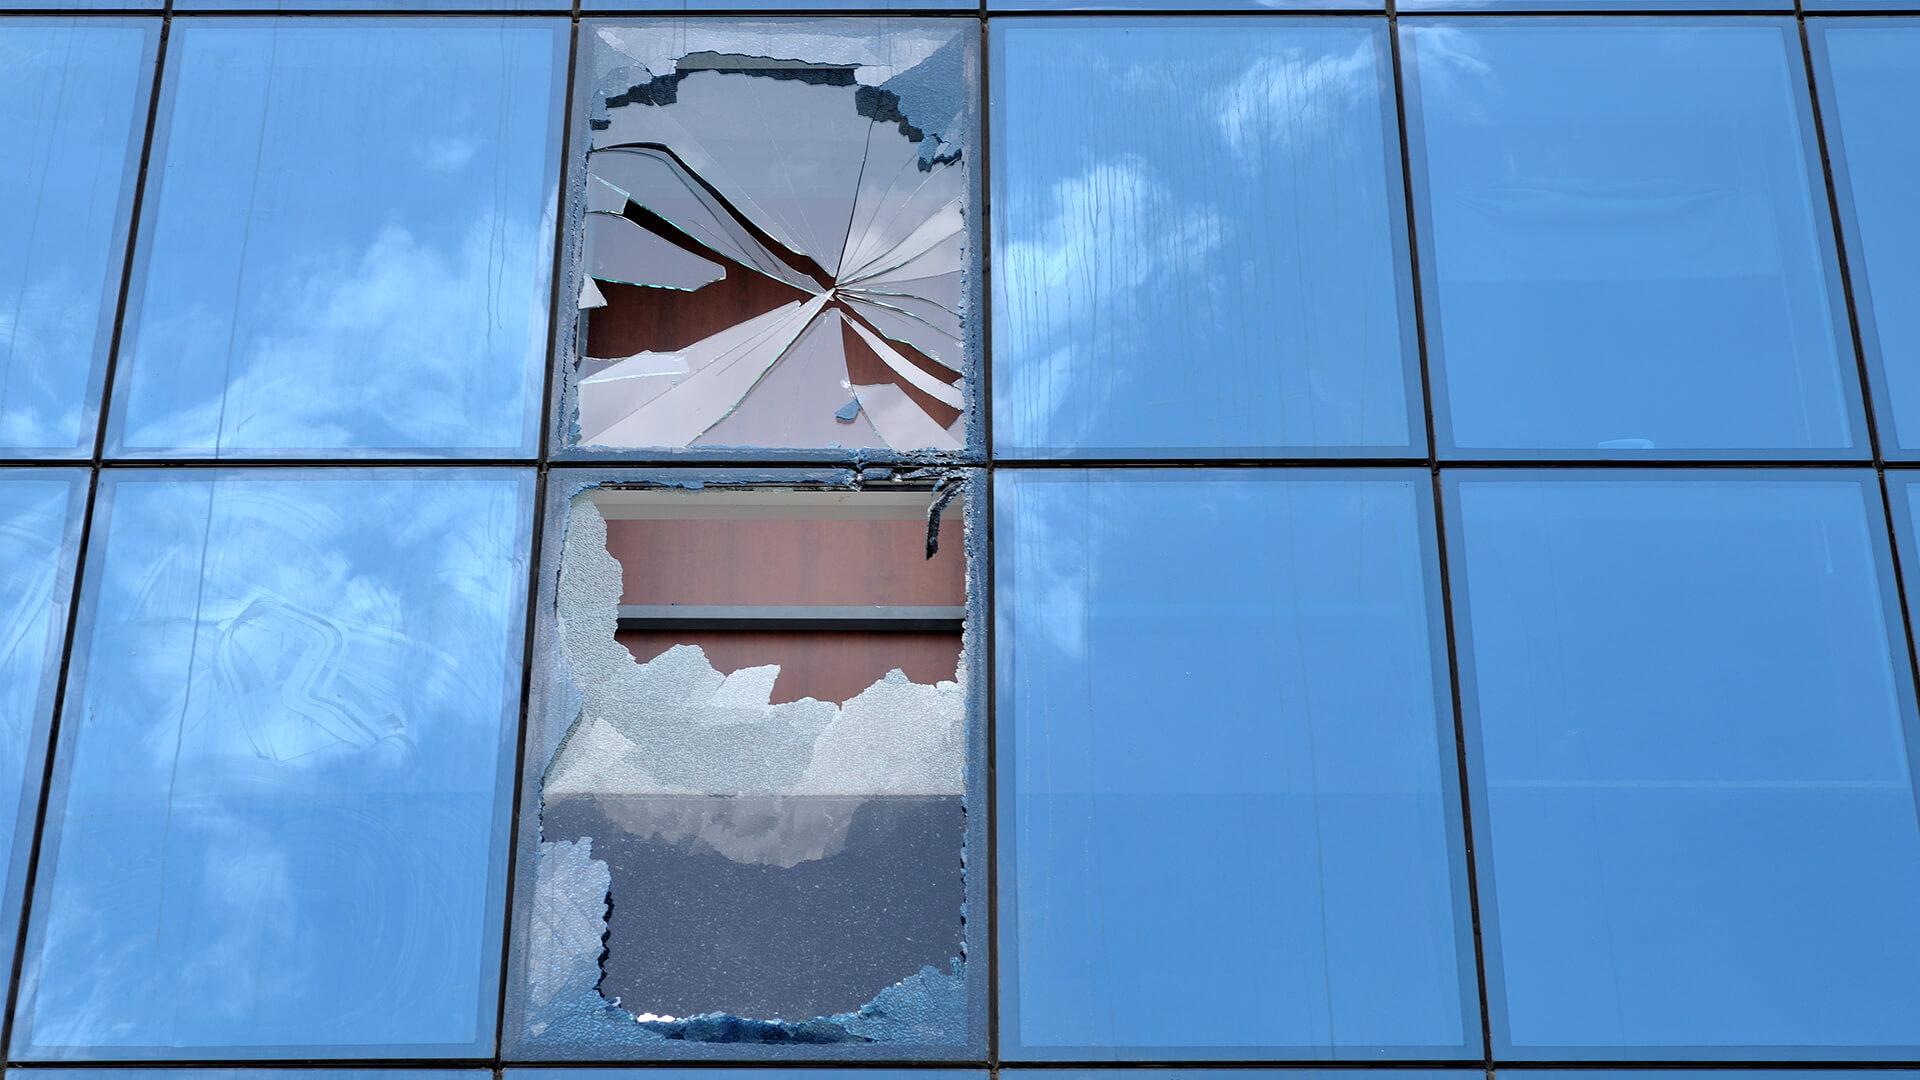 dis cephe cam tamiri - Dış Cephe Camları